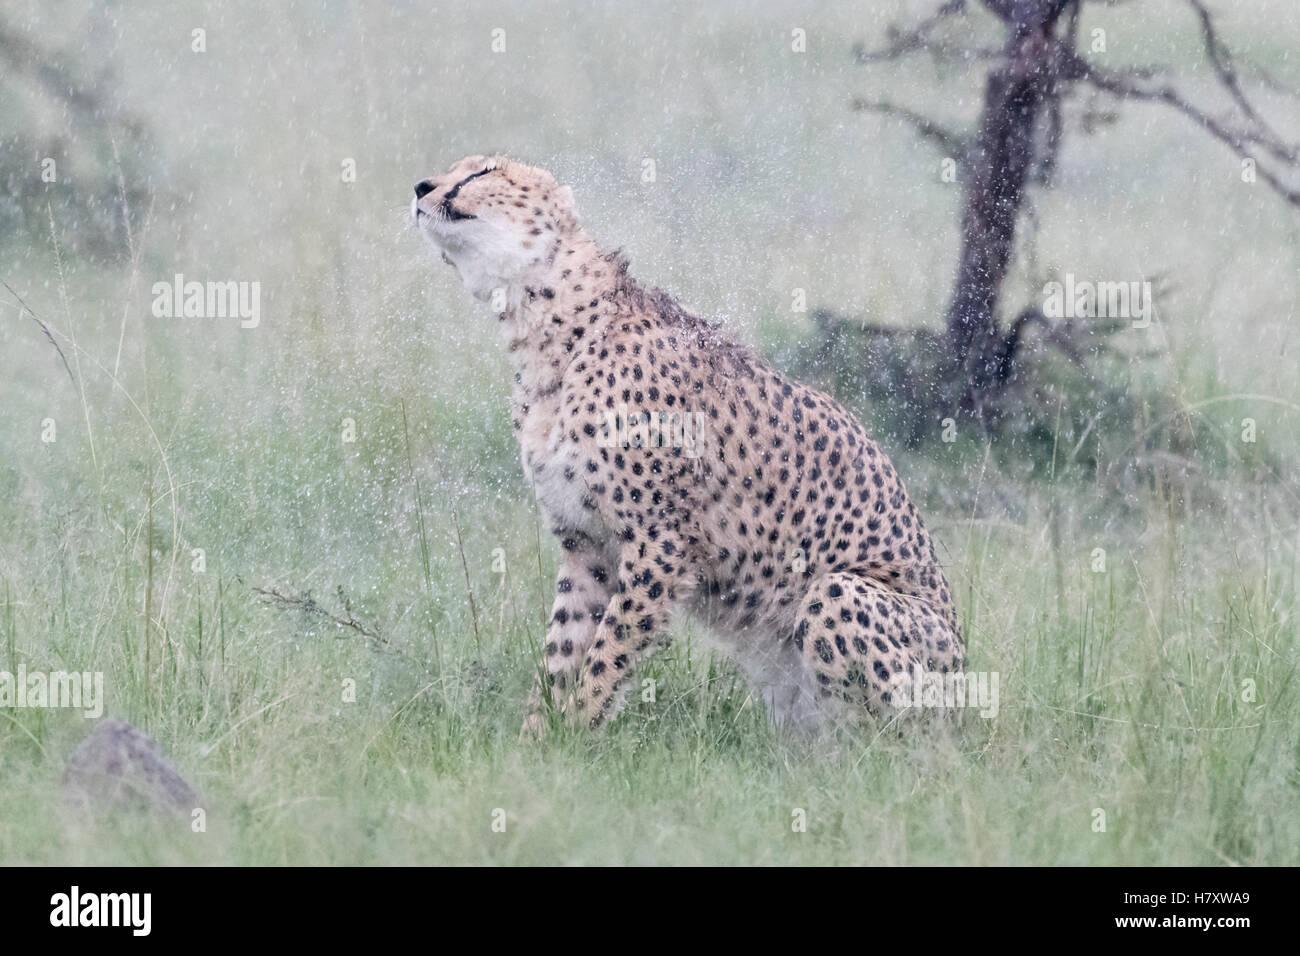 Cheetah (Acinonix jubatus) sitting on savanna during rainfall, shaking wet fur, Maasai Mara National Reserve, Kenya - Stock Image